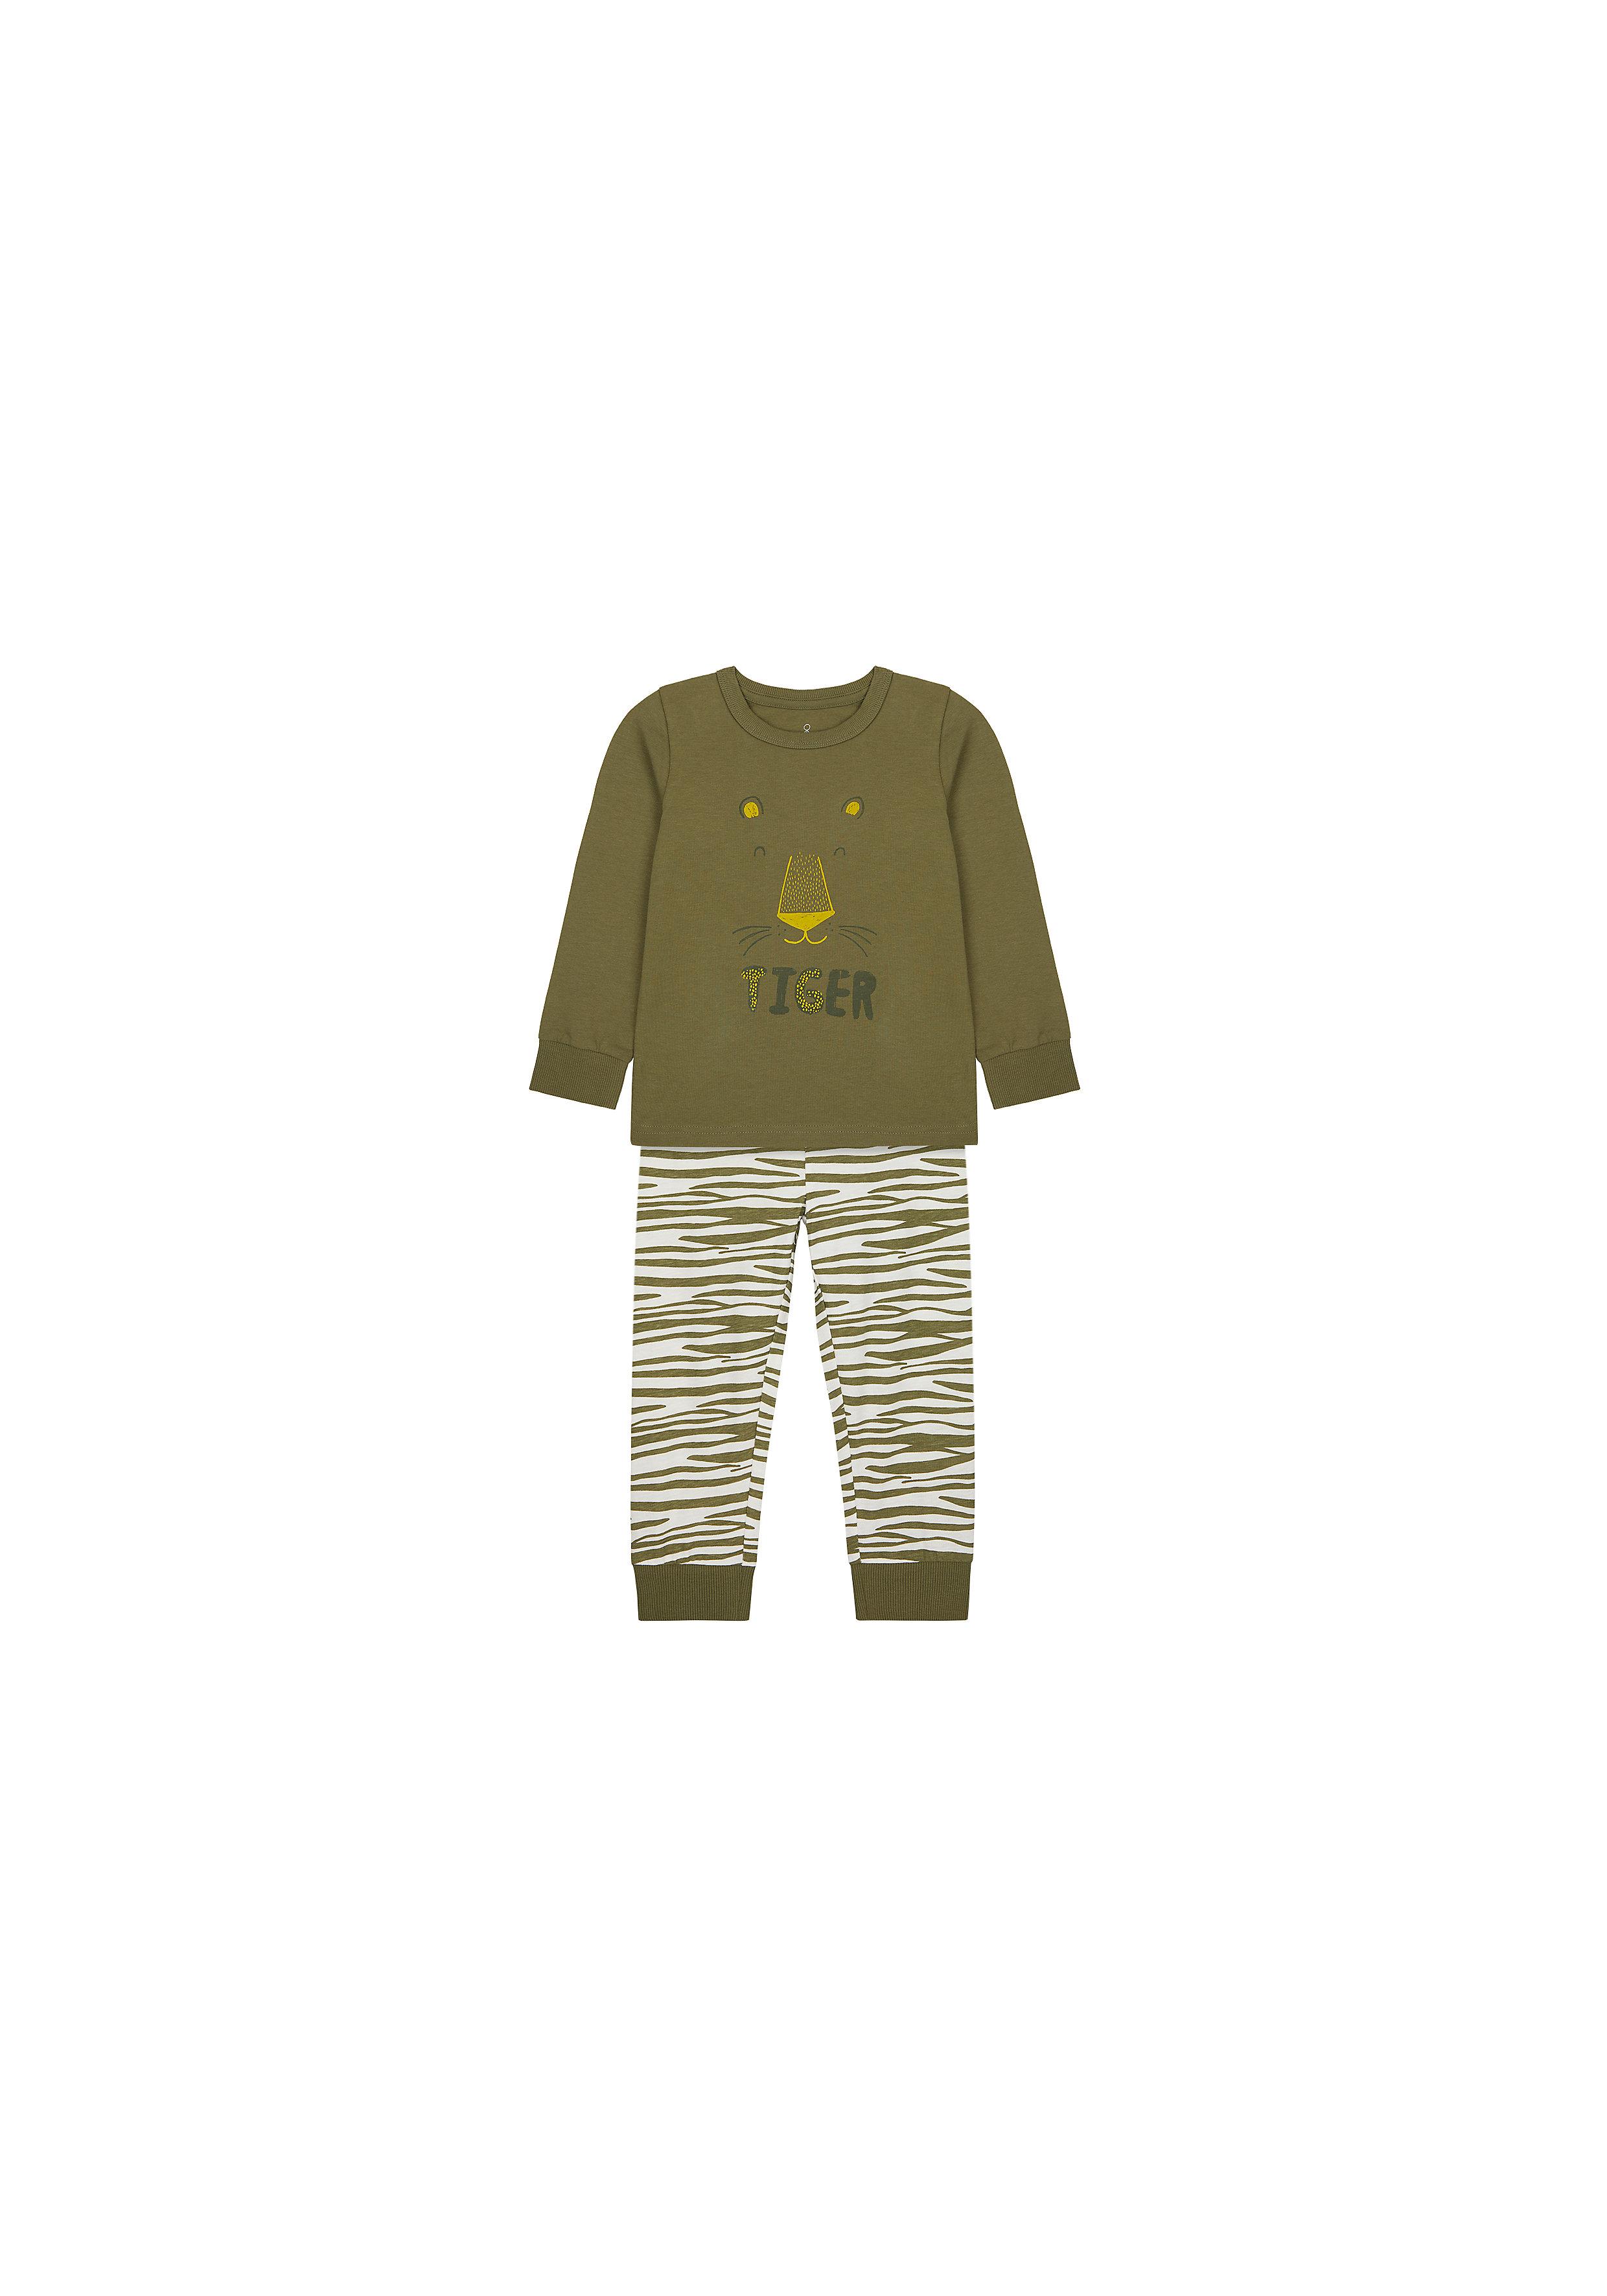 Mothercare   Boys Full Sleeves Pyjama Set Tiger Print - Green